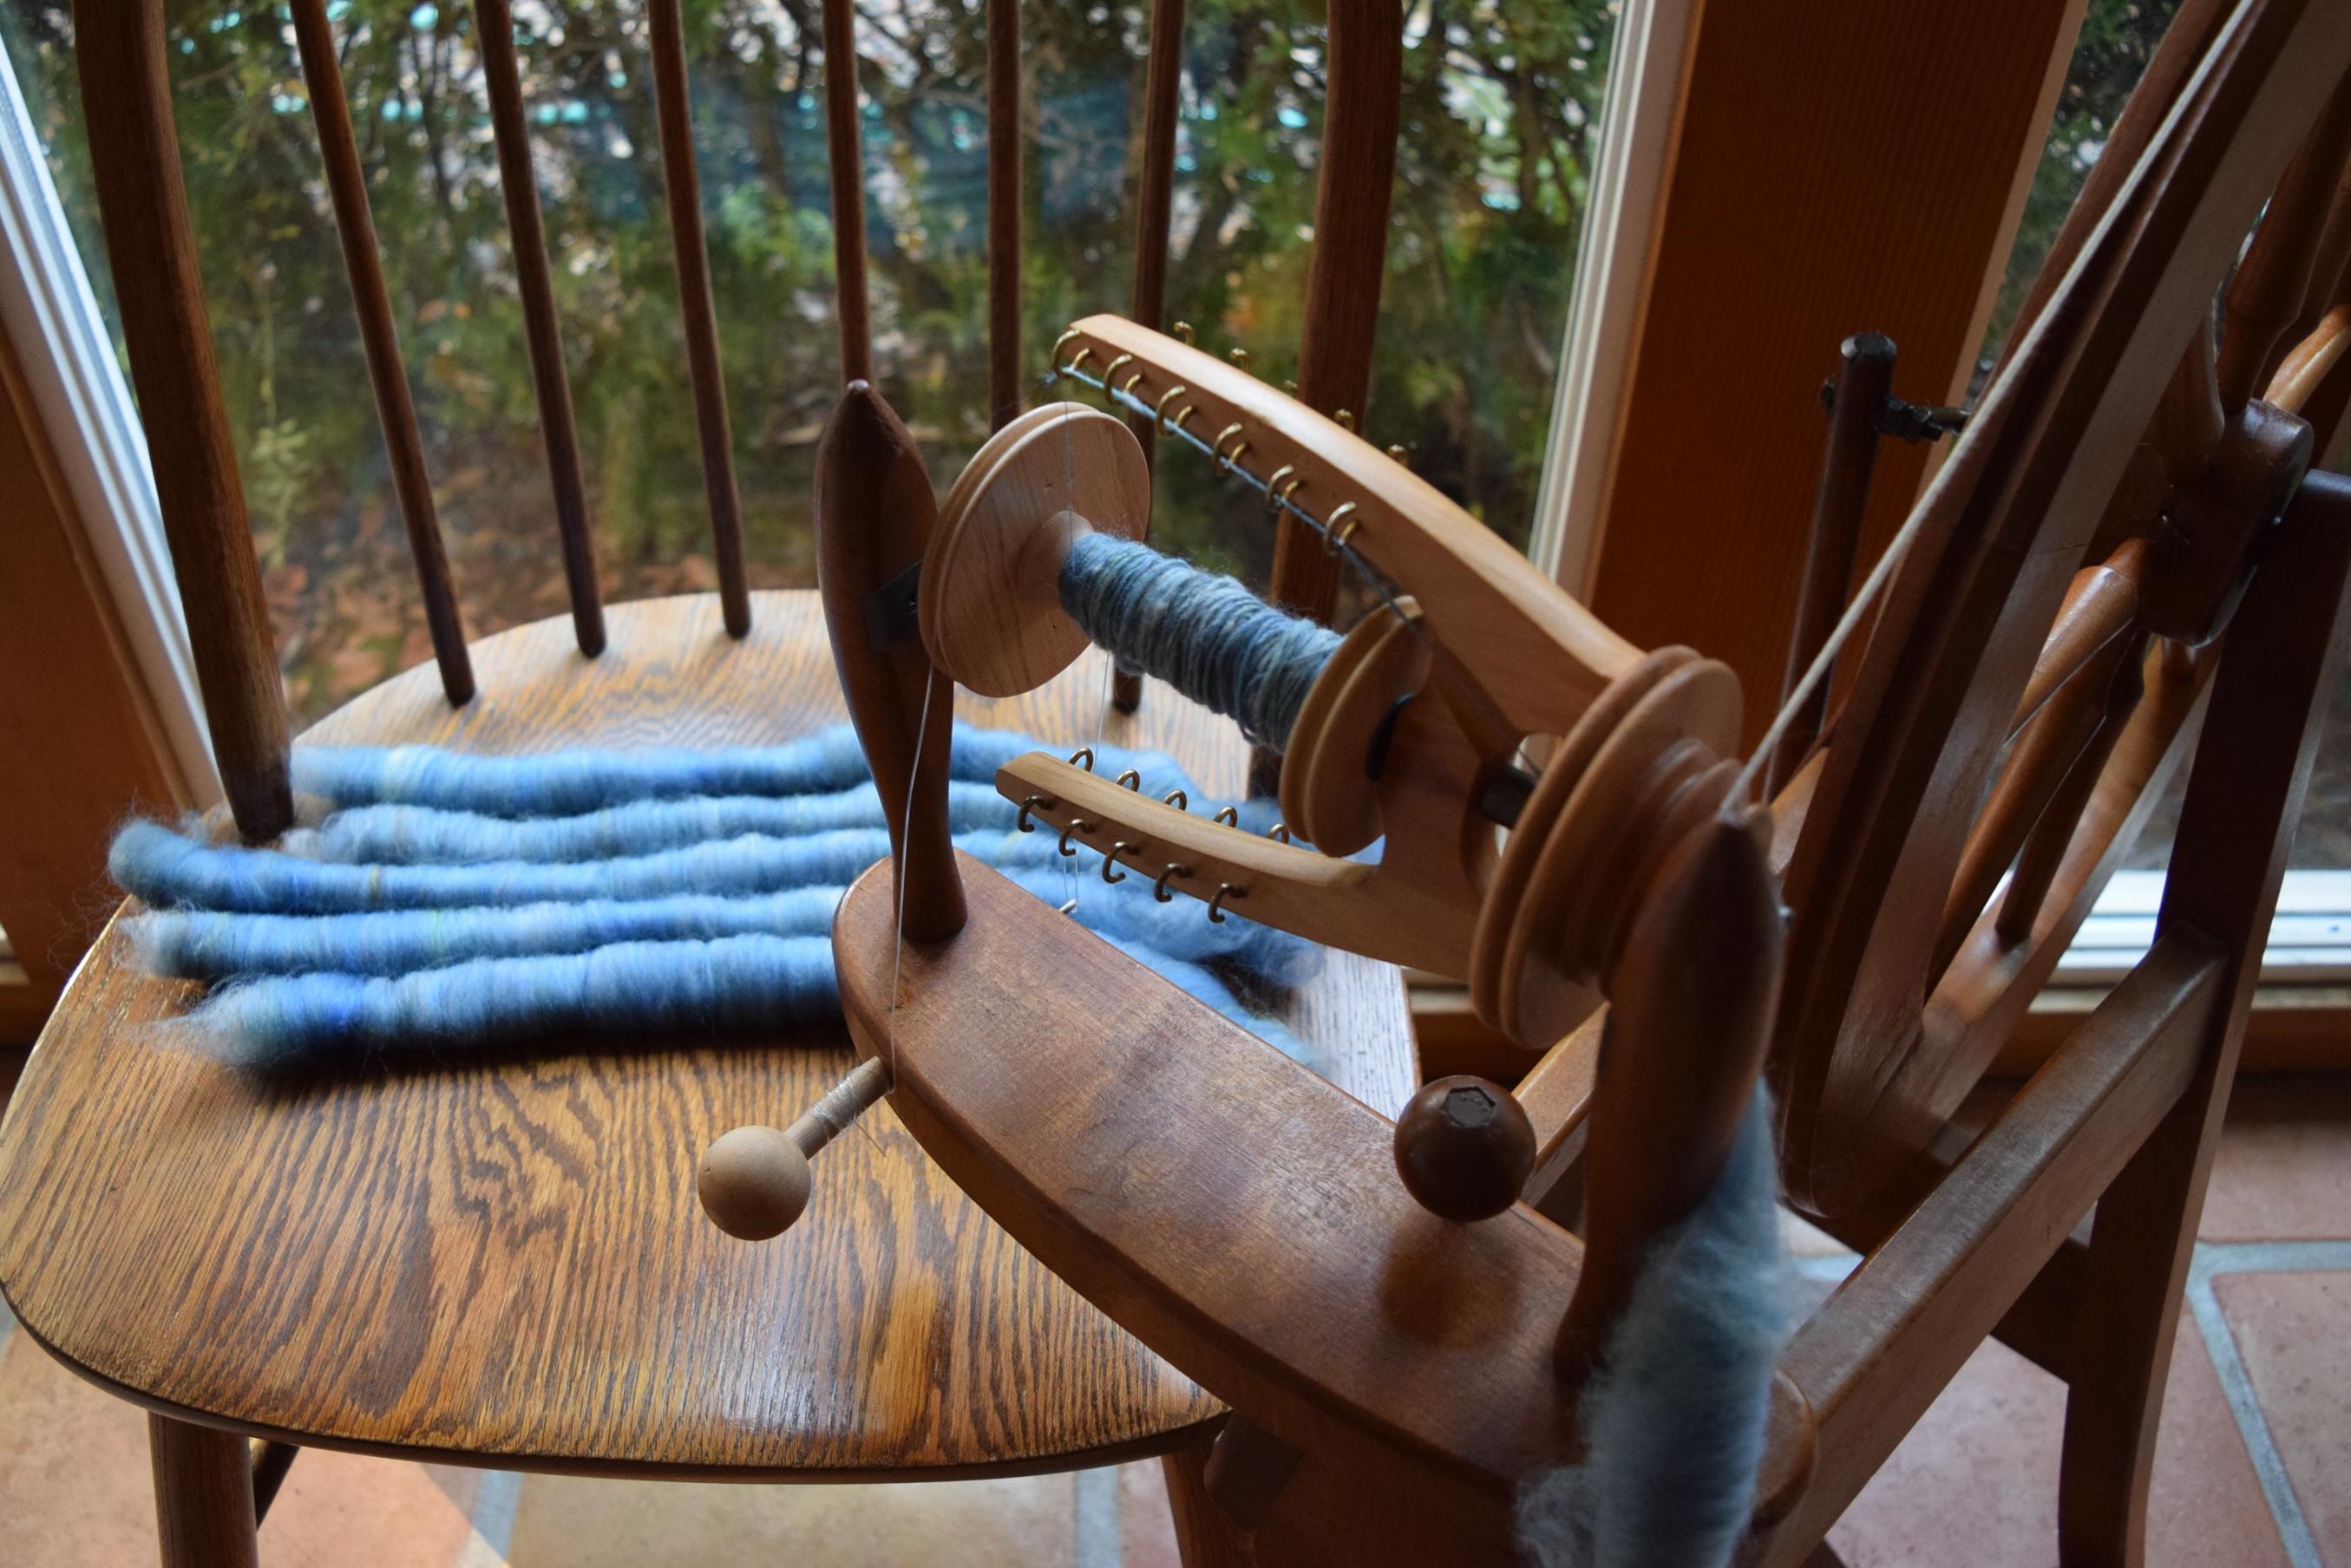 jenjoycedesign© spinning Wild Flax